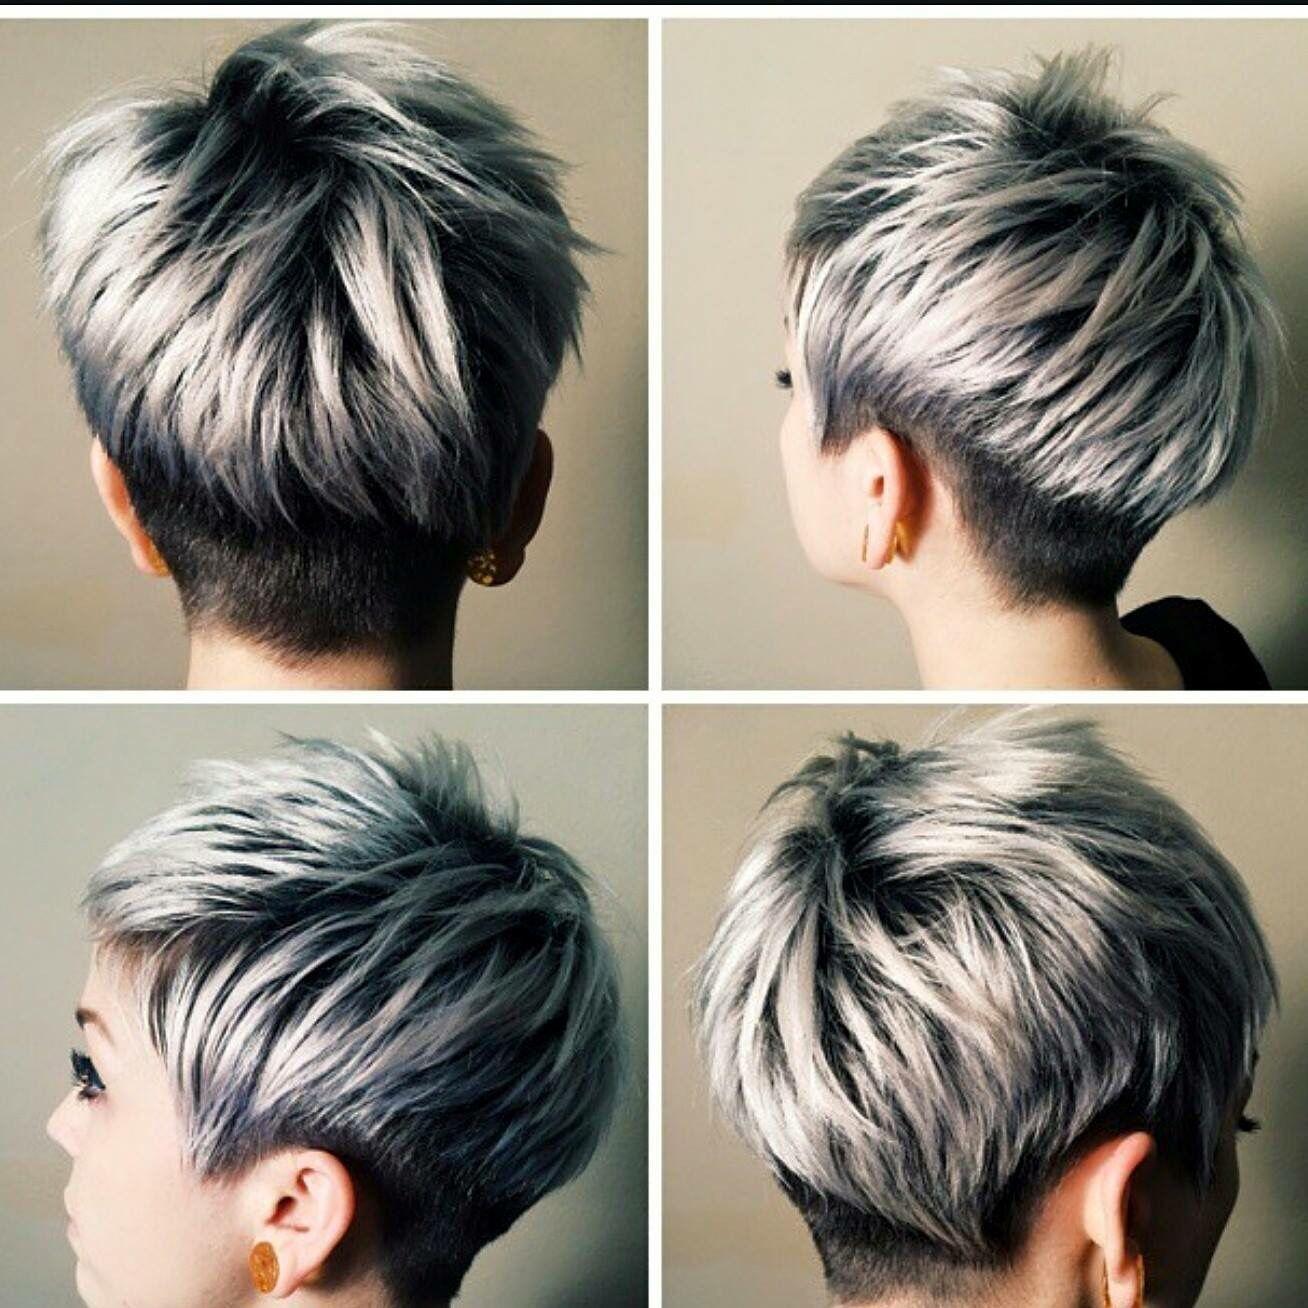 Hair colour image boy pin by wendy ferrencemceachern on likes  pinterest  short hair